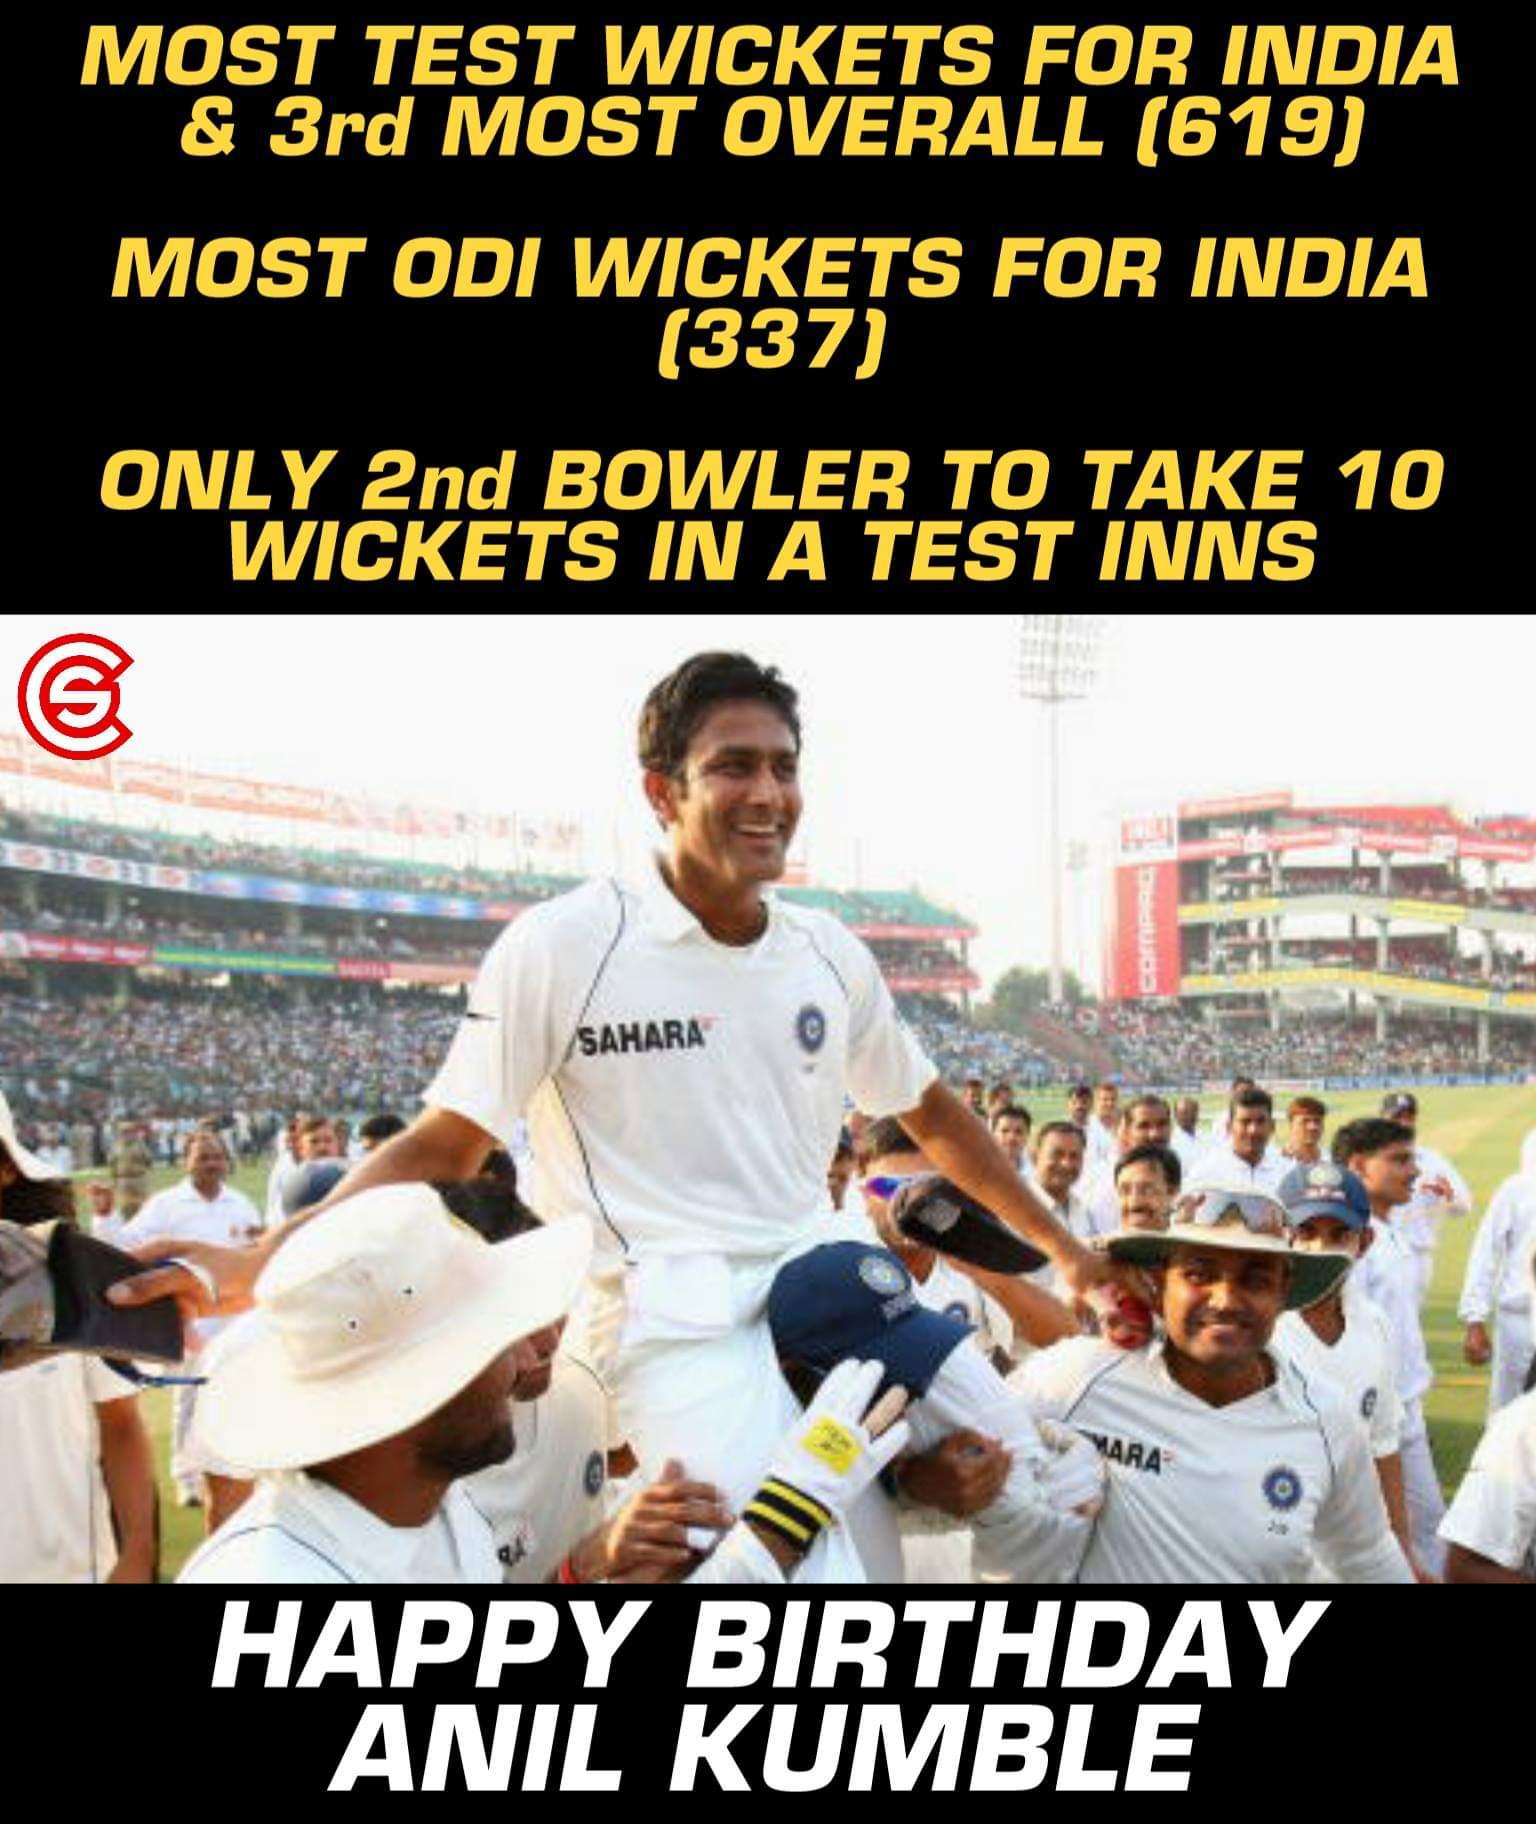 Happy Birthday, Anil Kumble!!